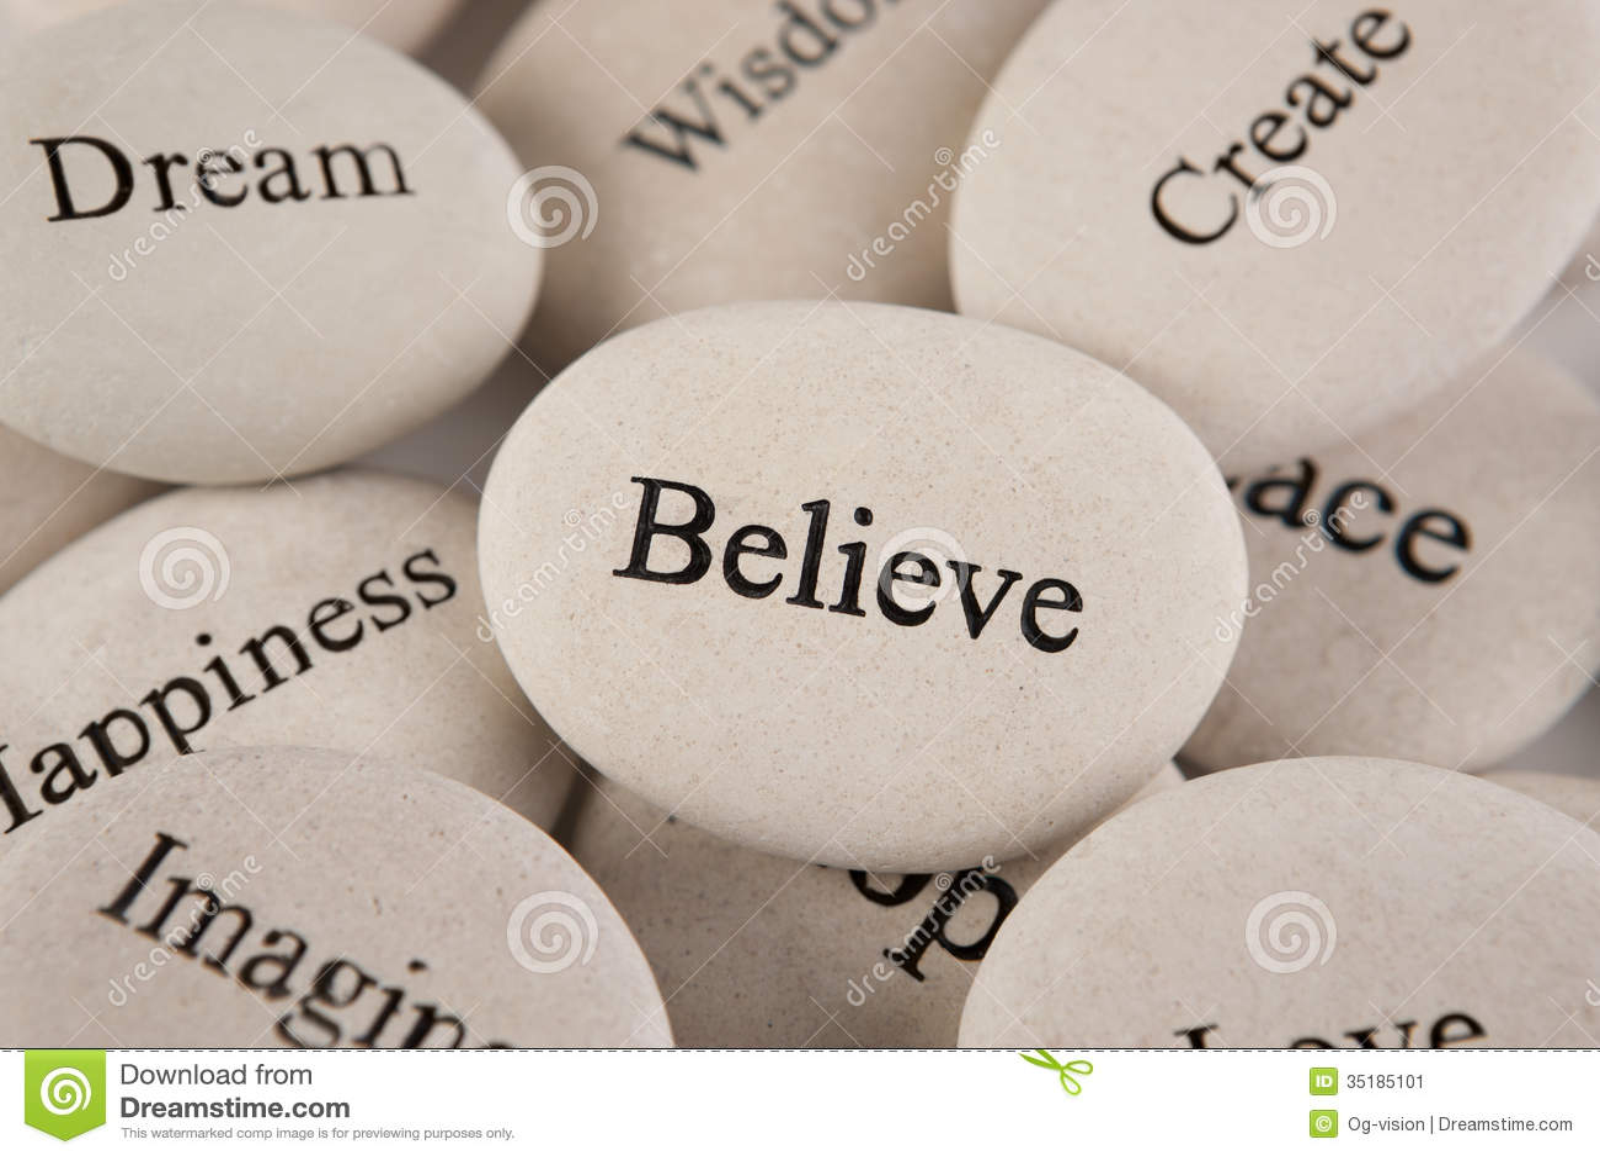 inspirational stones stock image image 35185101